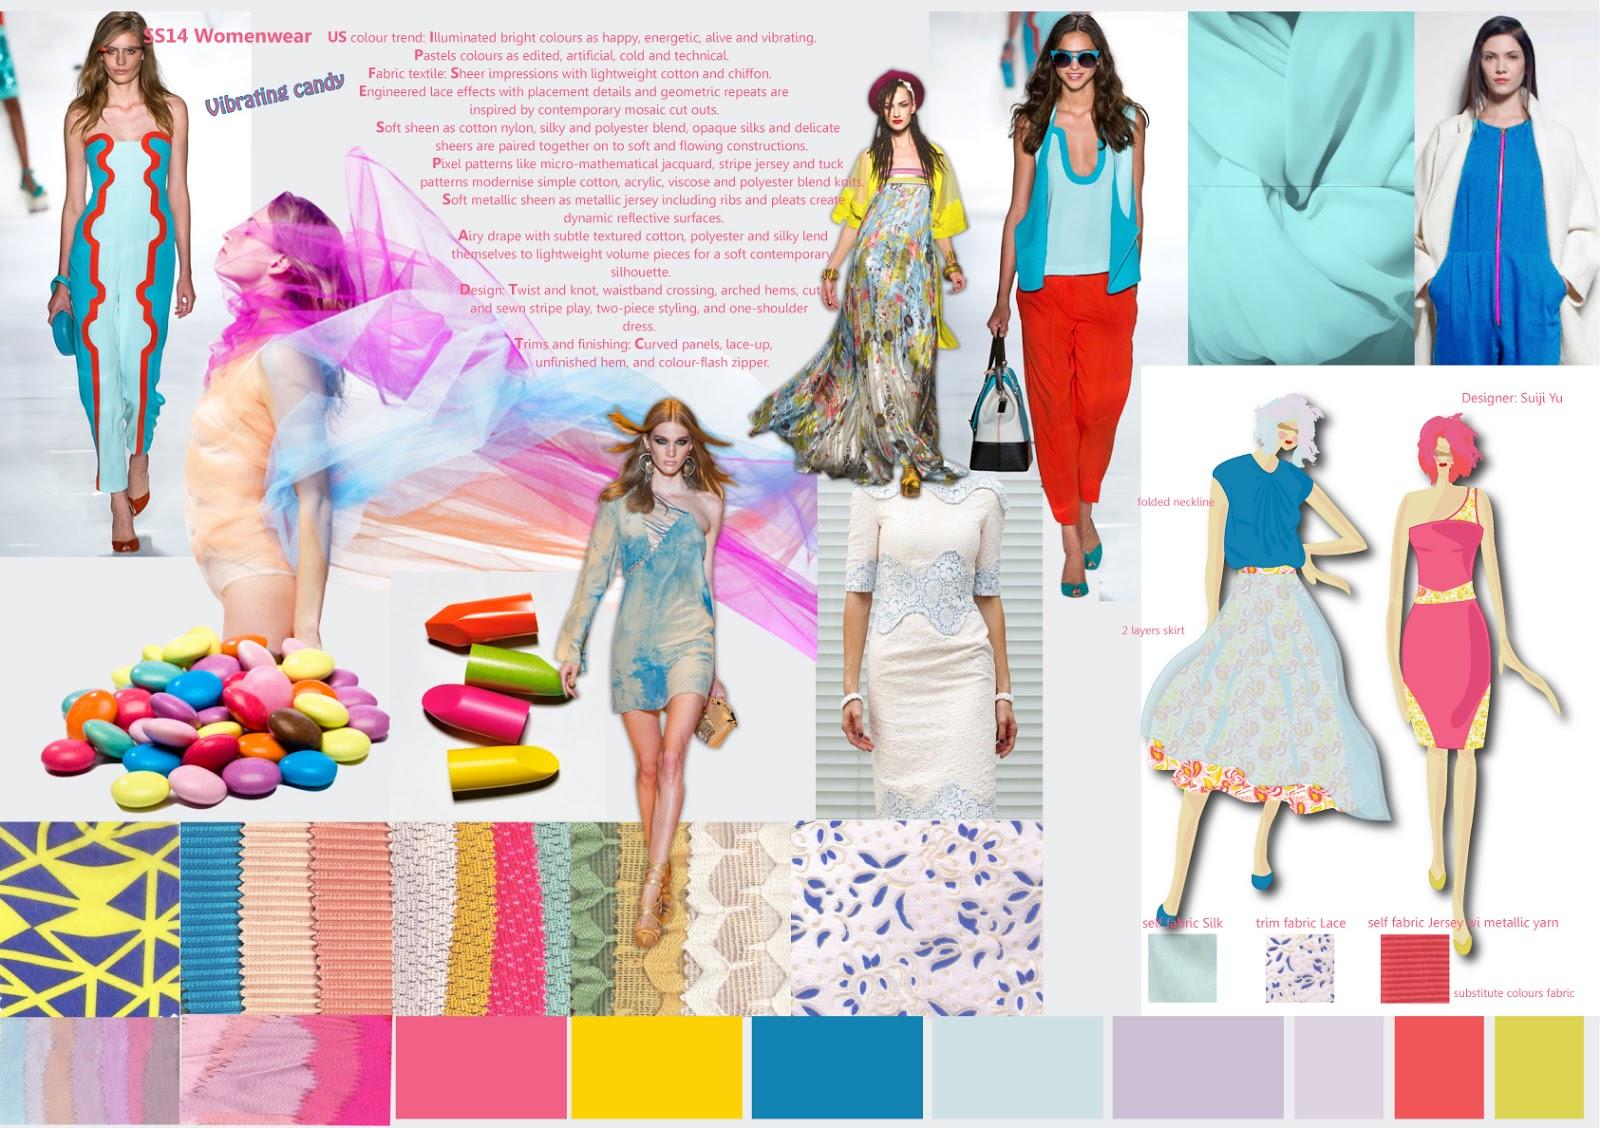 Creating a fashion mood board